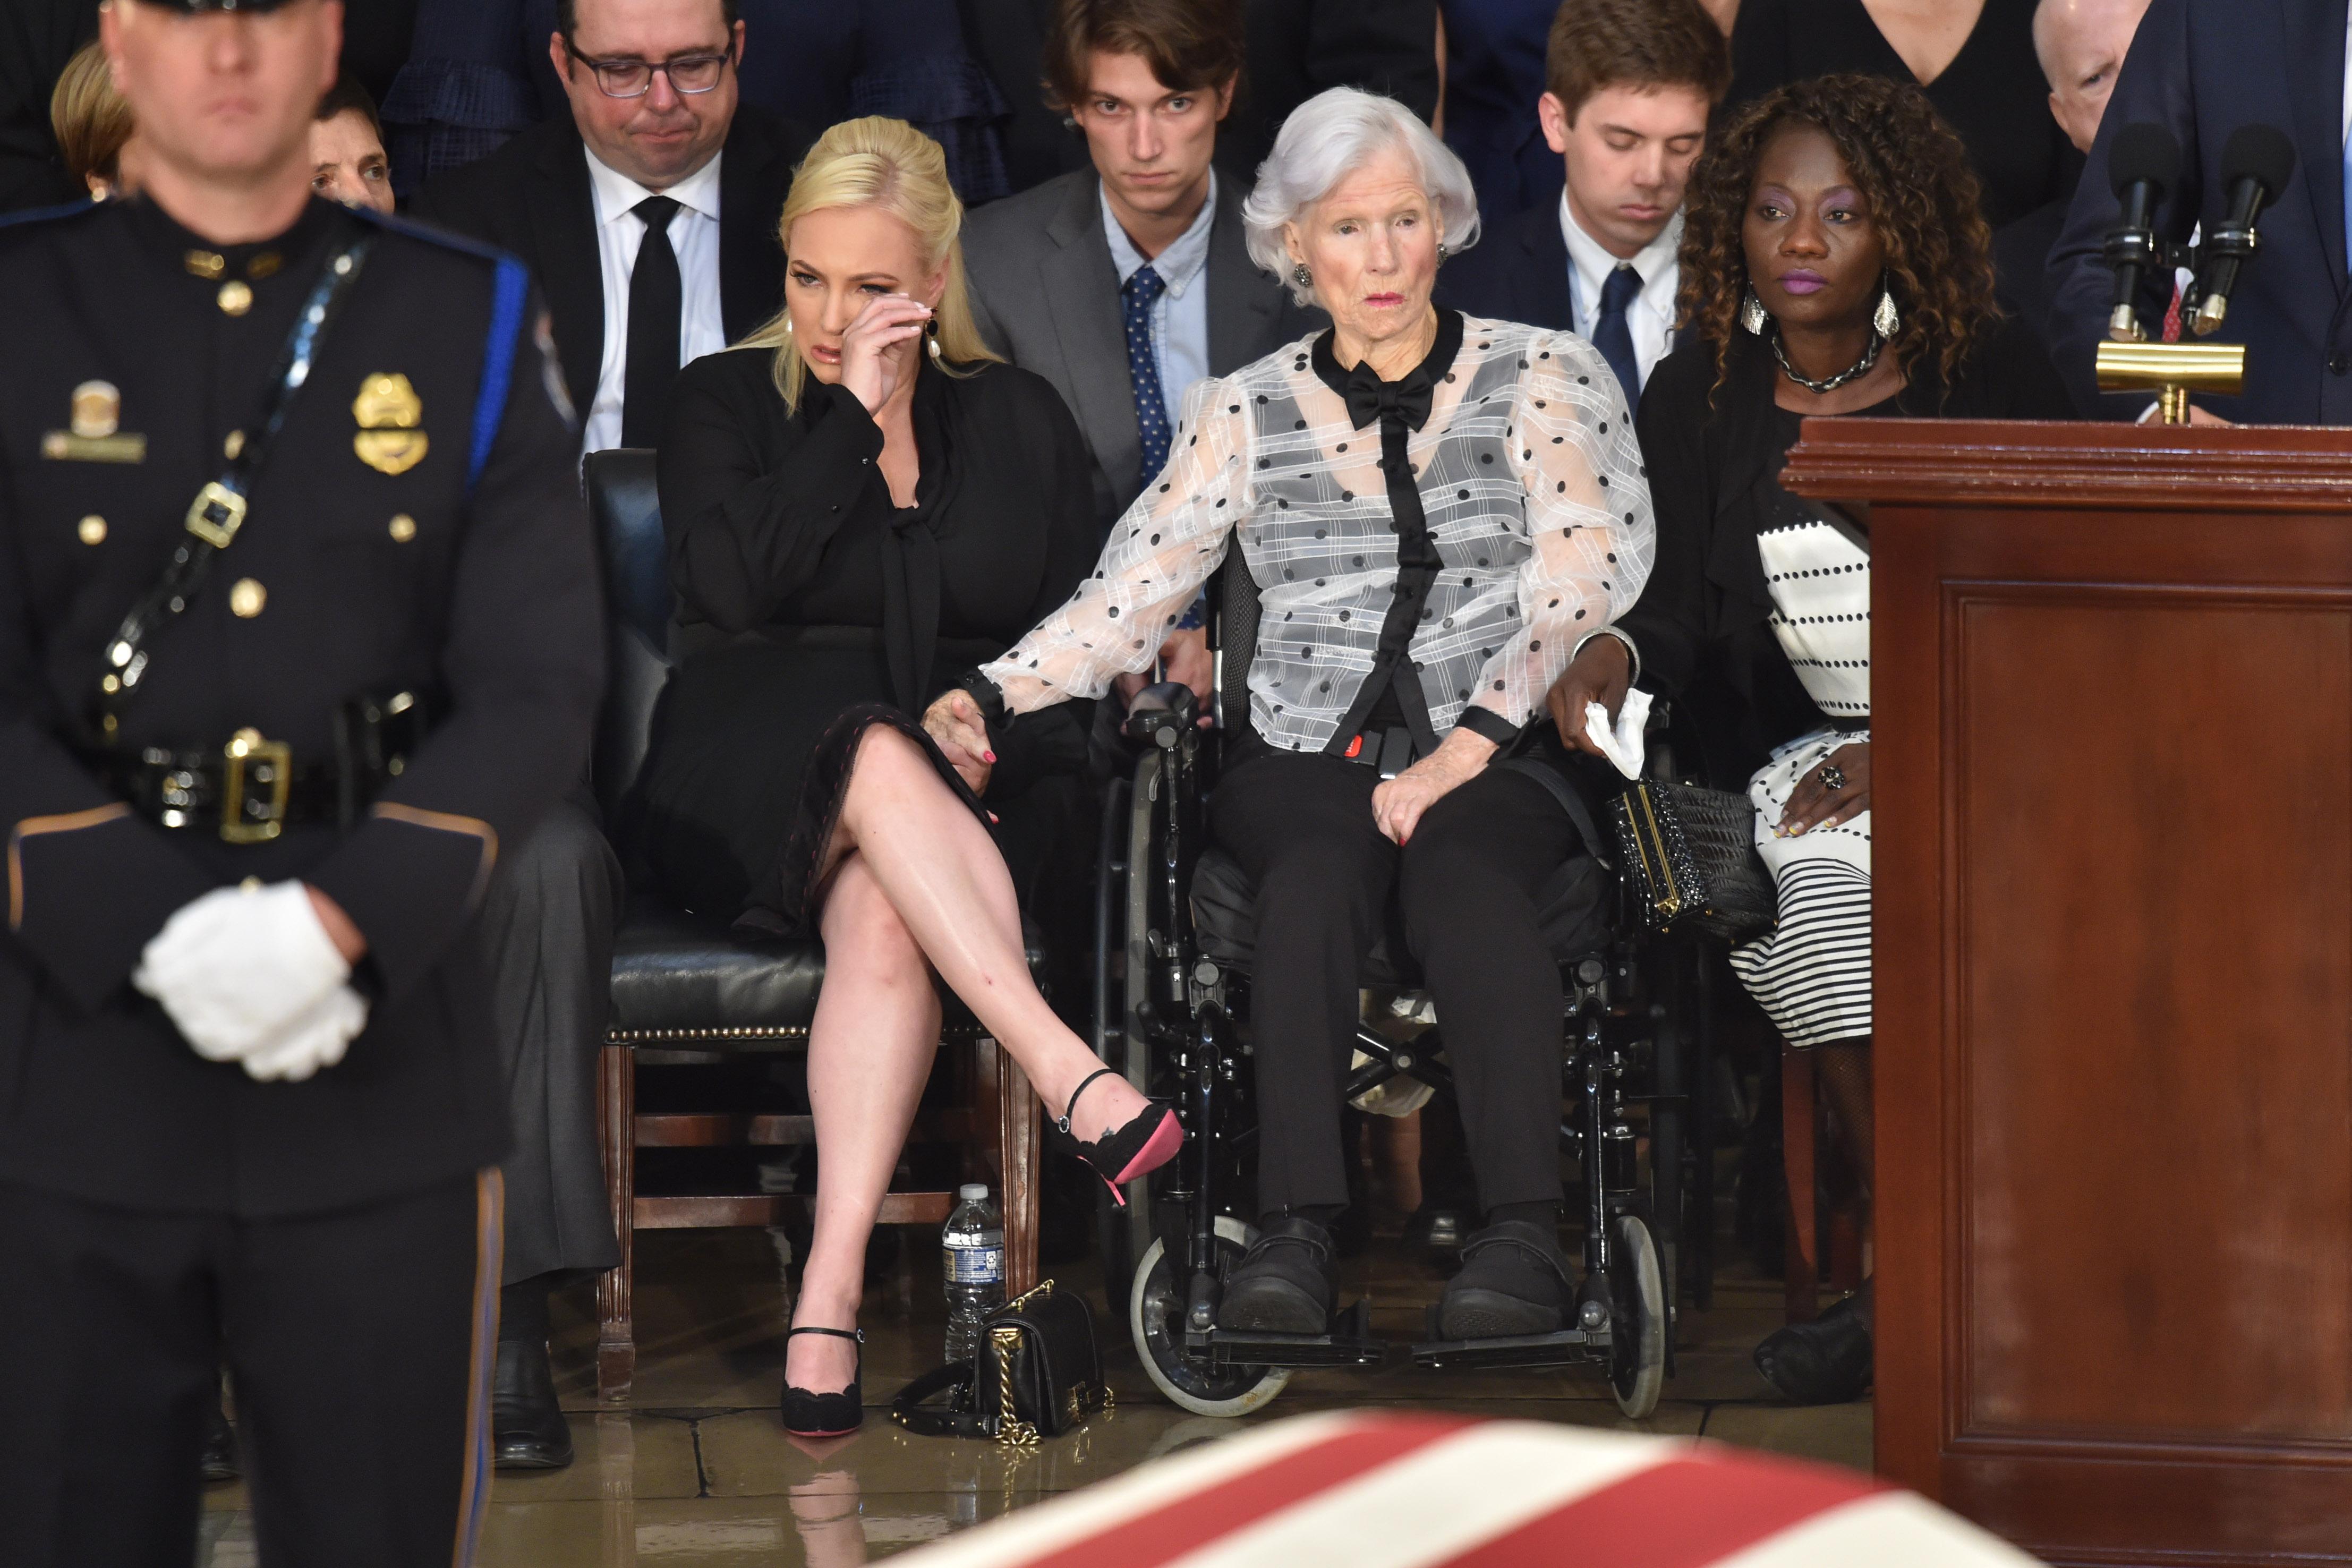 Roberta McCain, age 106, mother of the late US Senator John McCain, and granddaughter Meghan McCain attend the ceremony honoring Senator McCain at the US Capitol Rotunda on August 31, 2018 in Washington, DC.